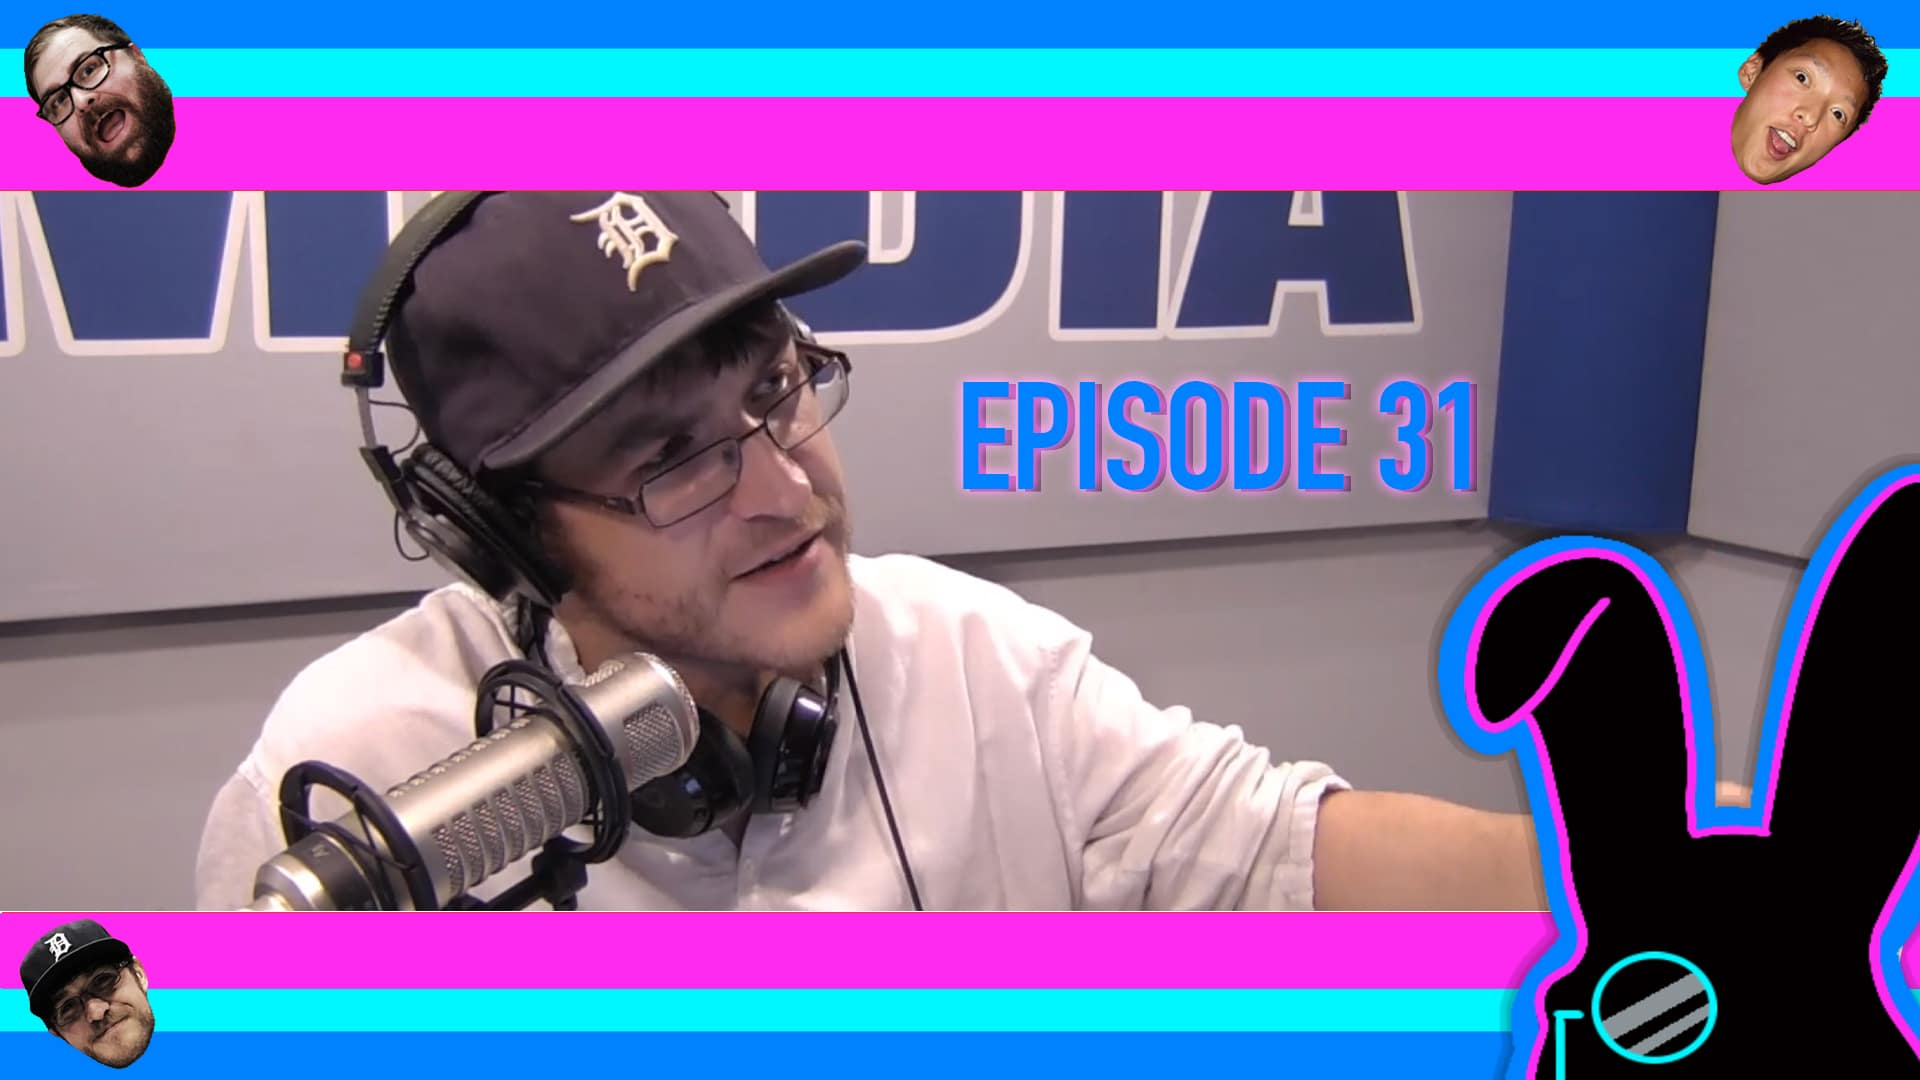 Geektainment Weekly - Episode 31